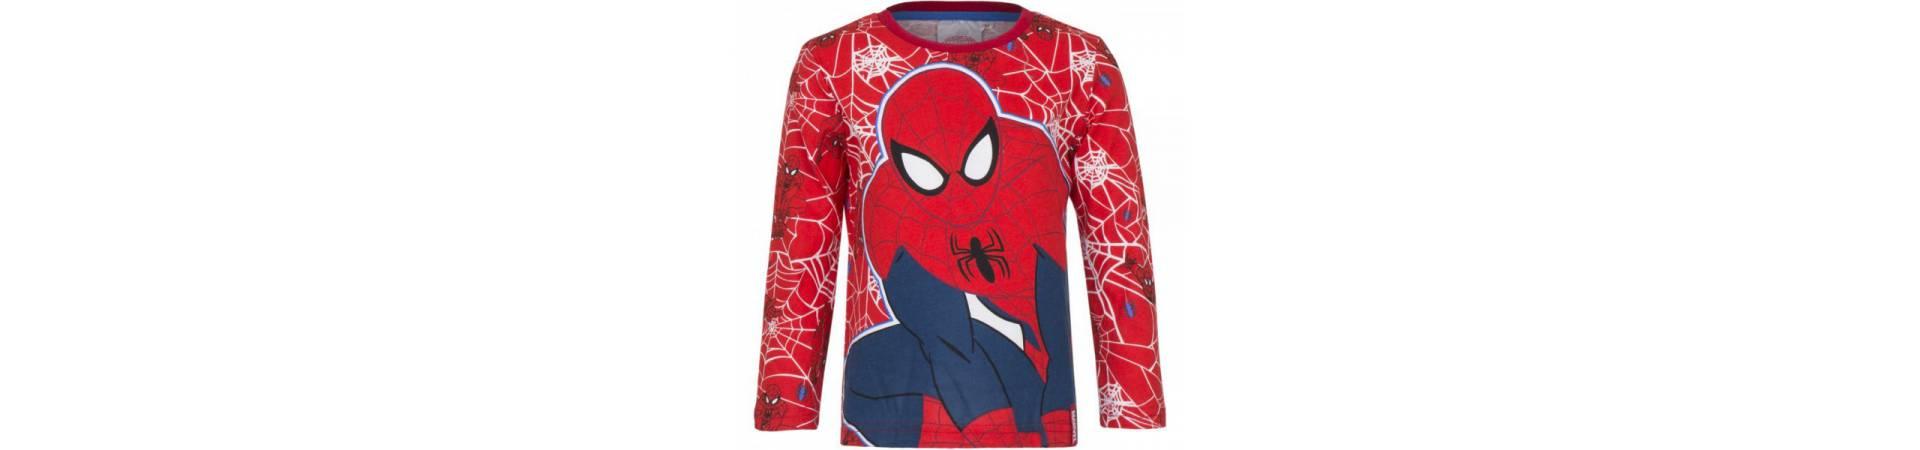 Spiderman Clothes